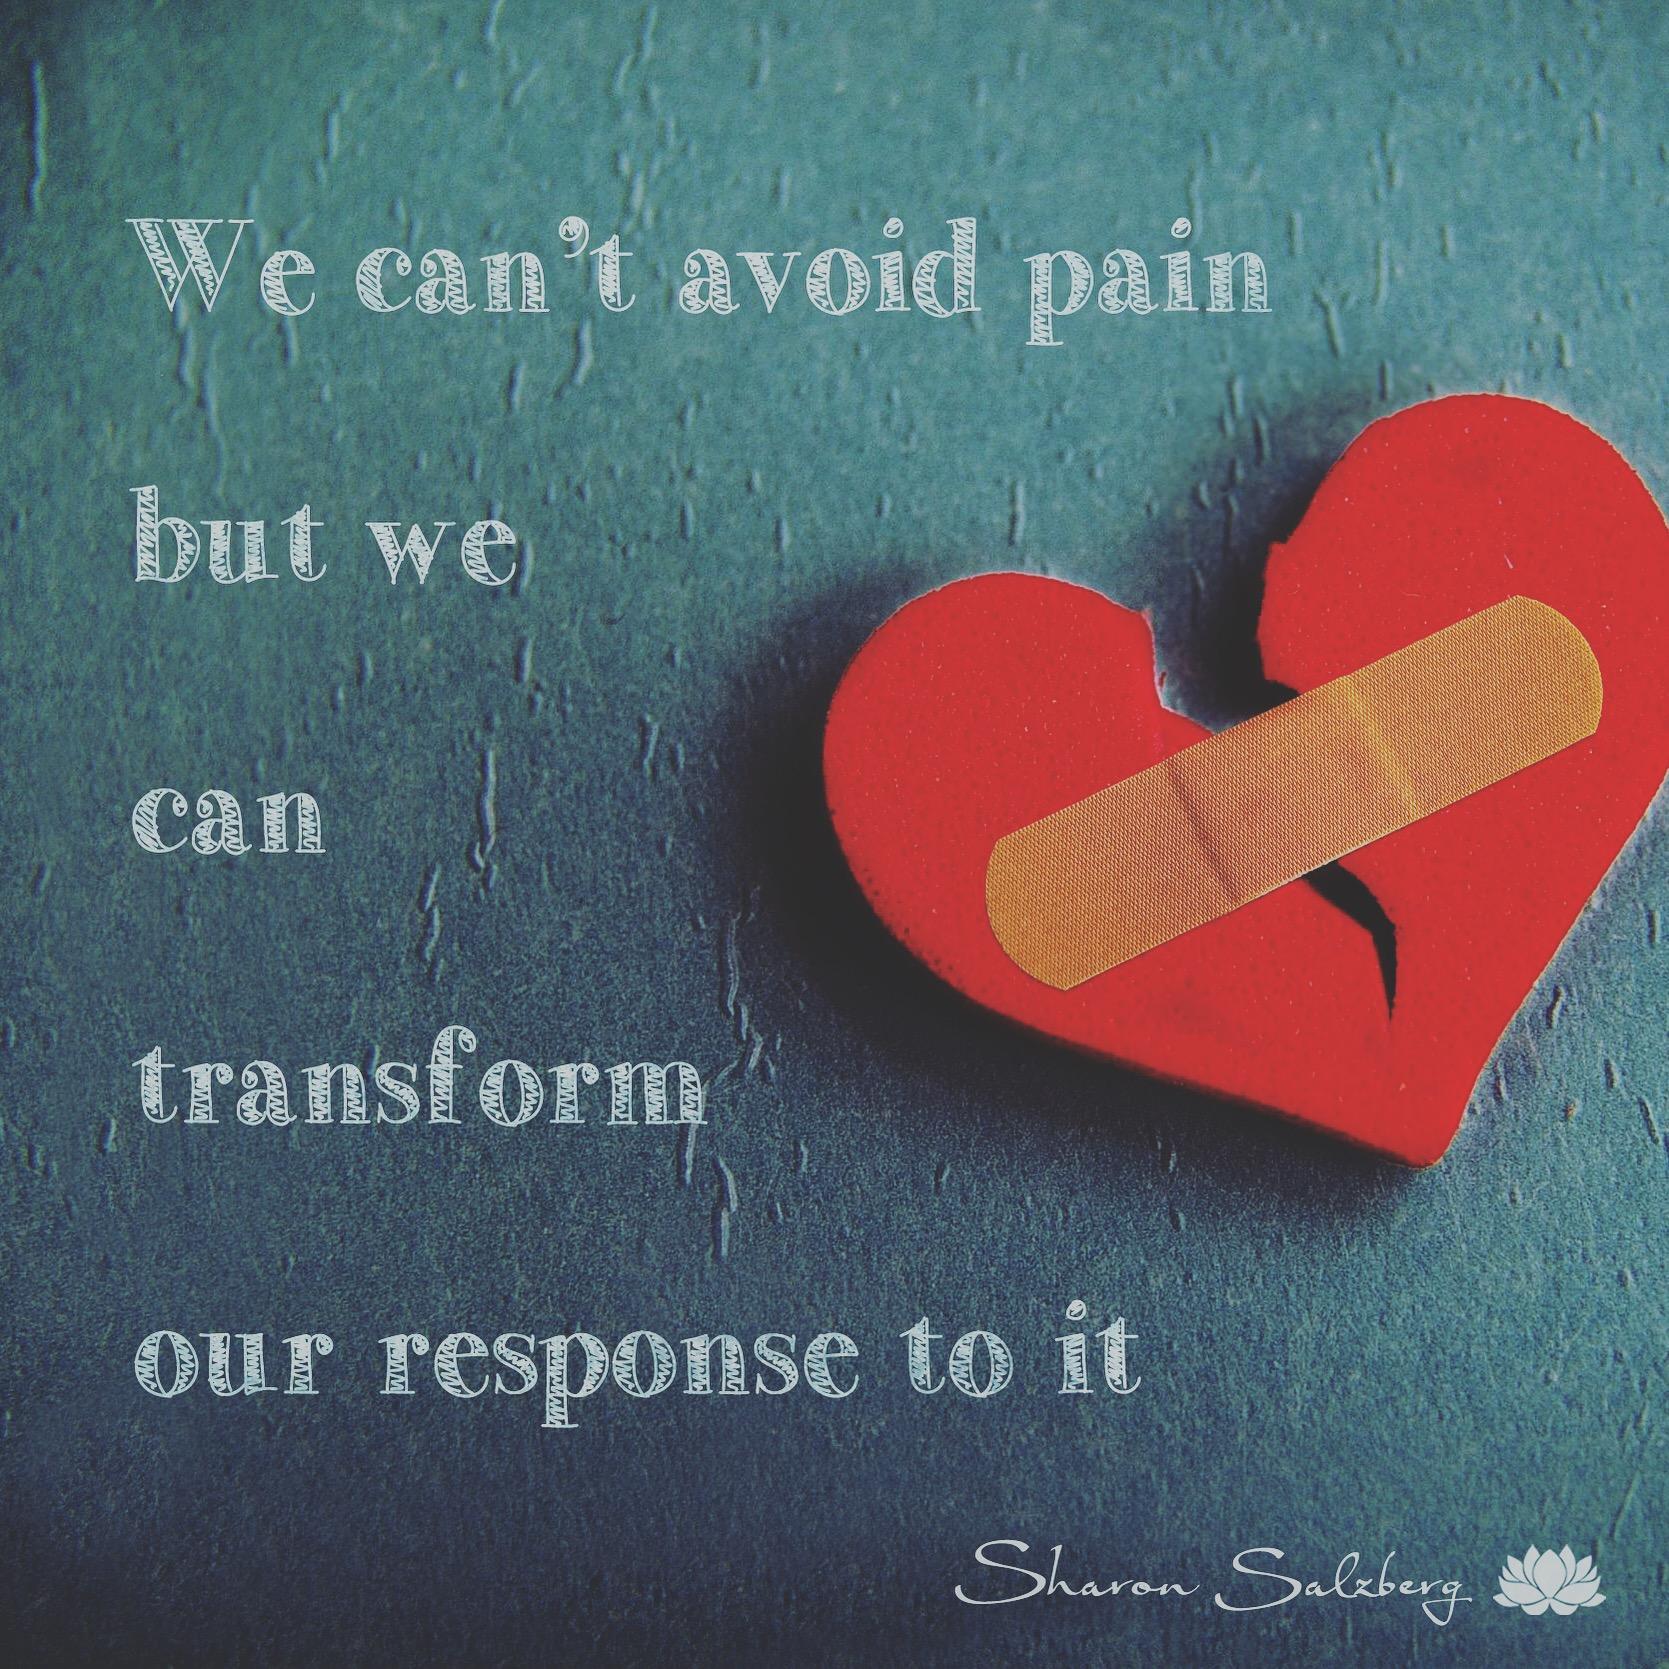 @SharonSalzberg #RealHappinessChallenge Day 17: Meditation on Negative Emotions